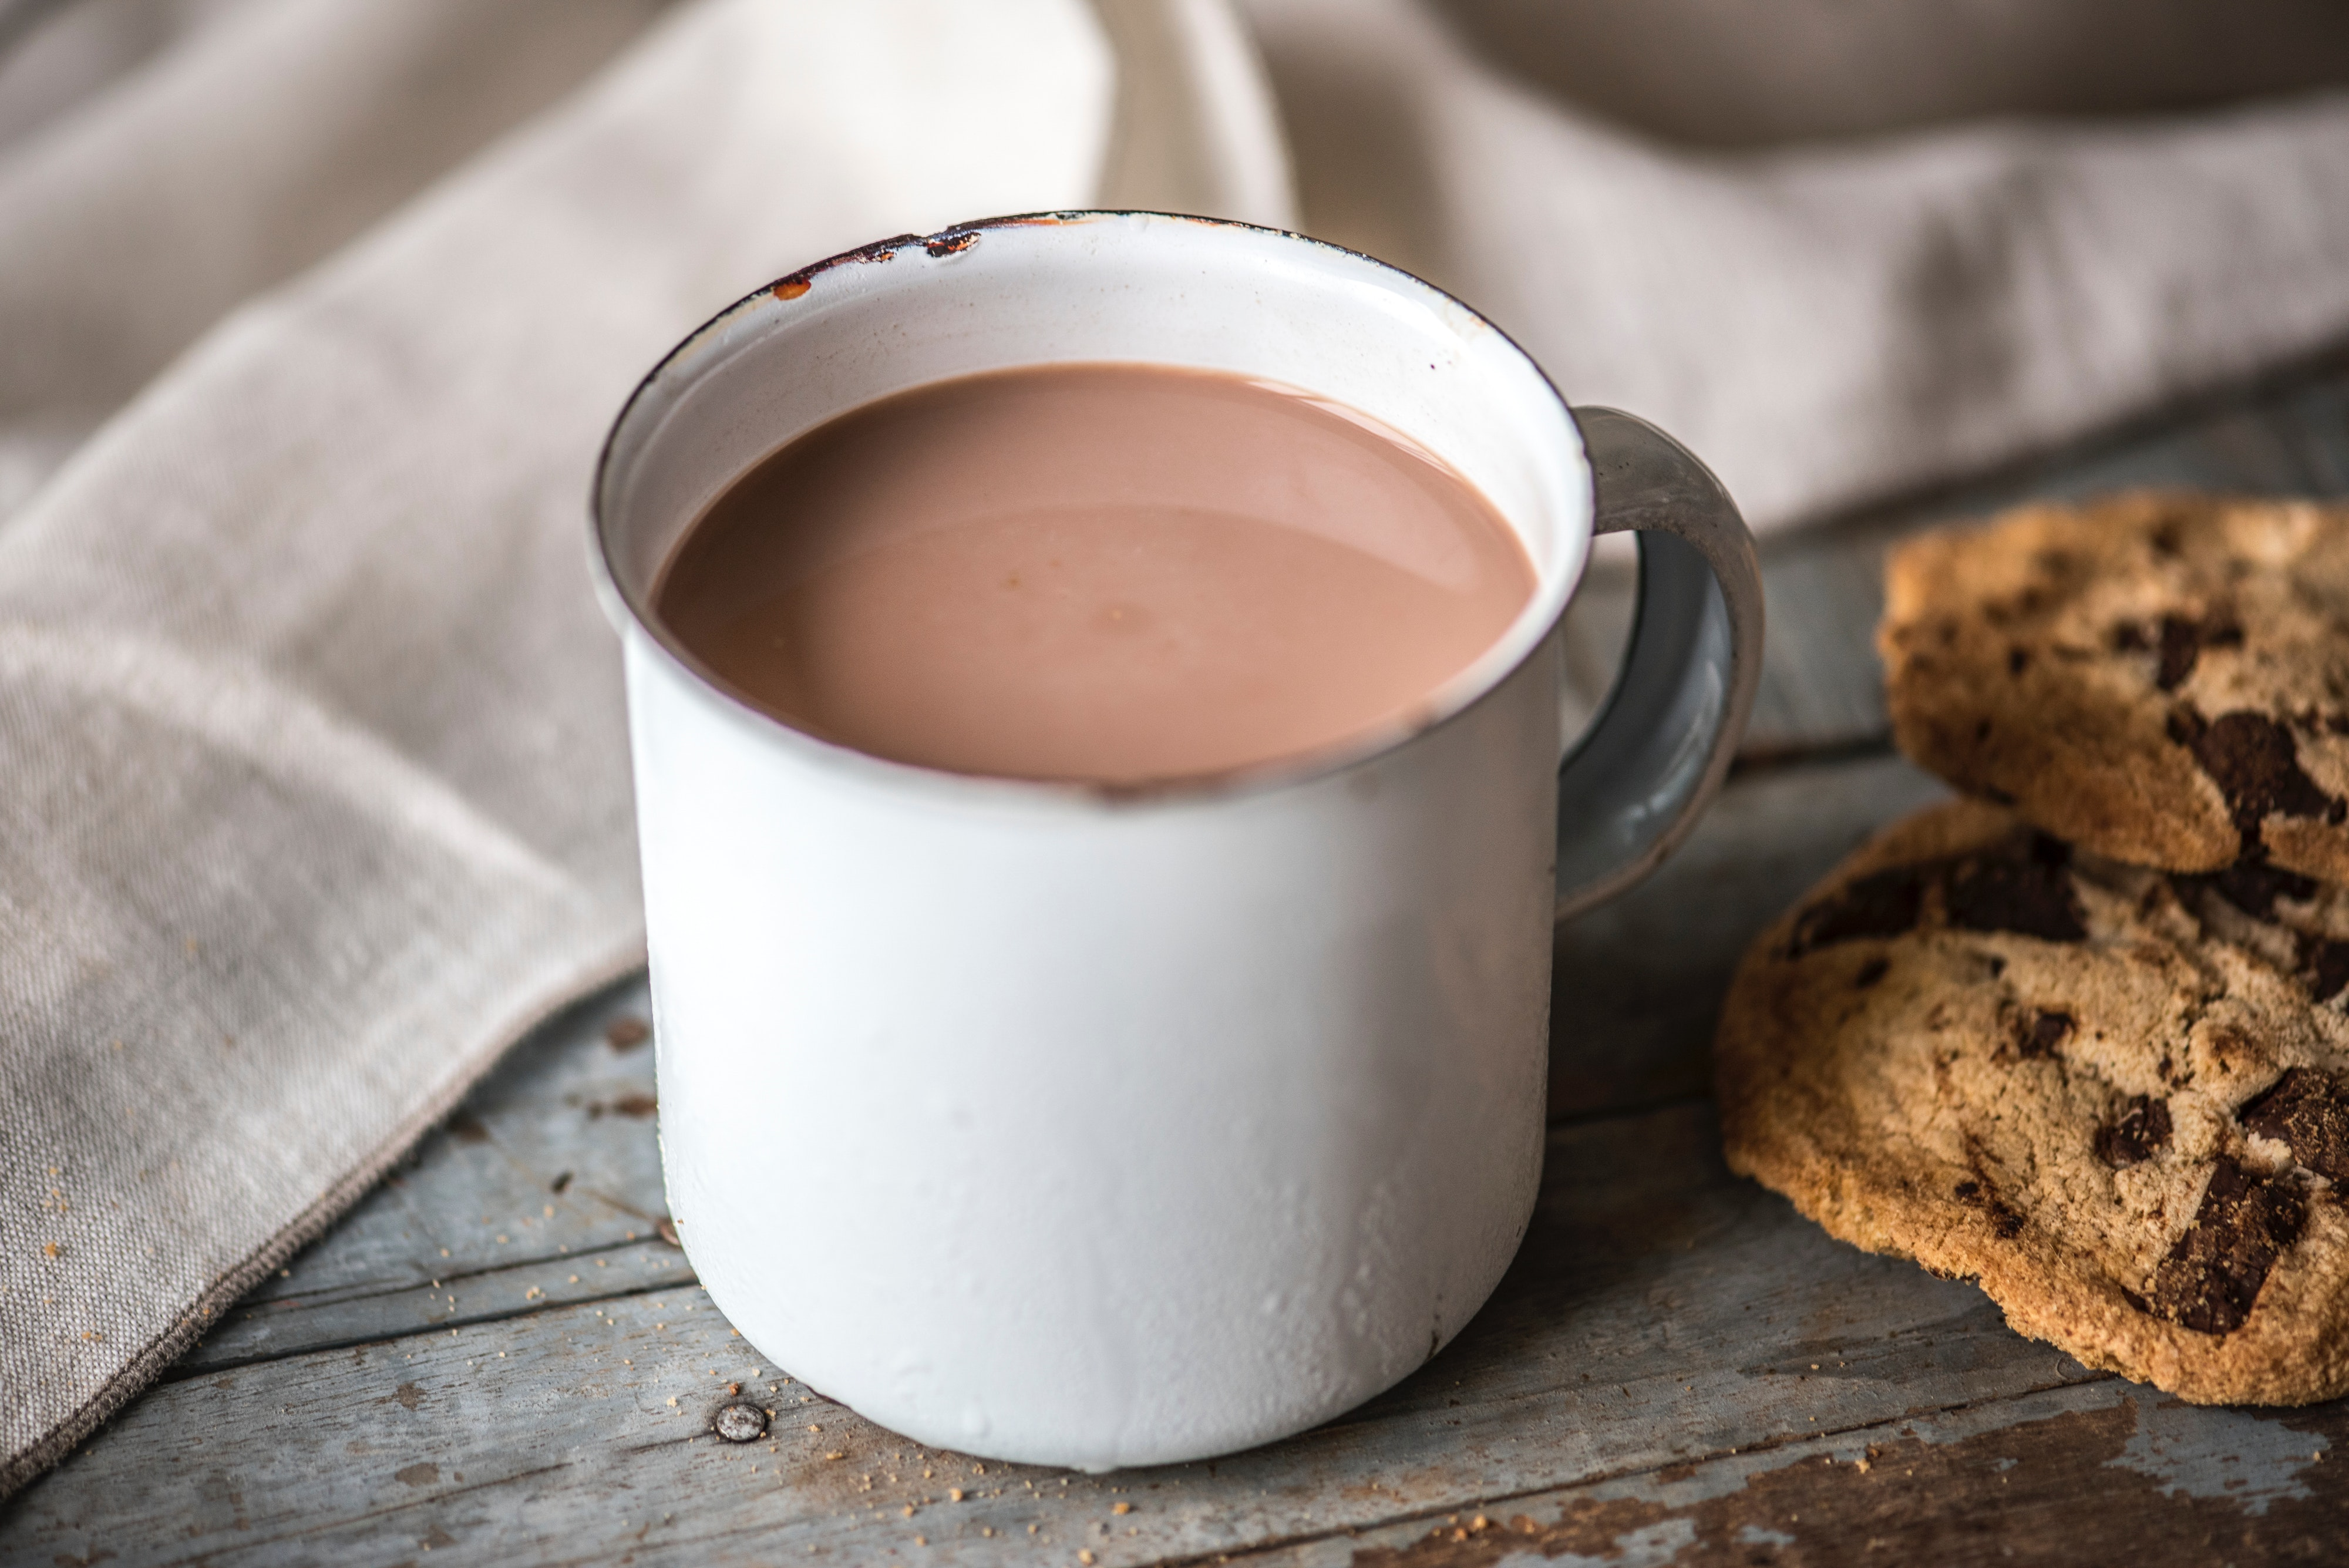 baked-beverage-biscuit-1493372.jpg